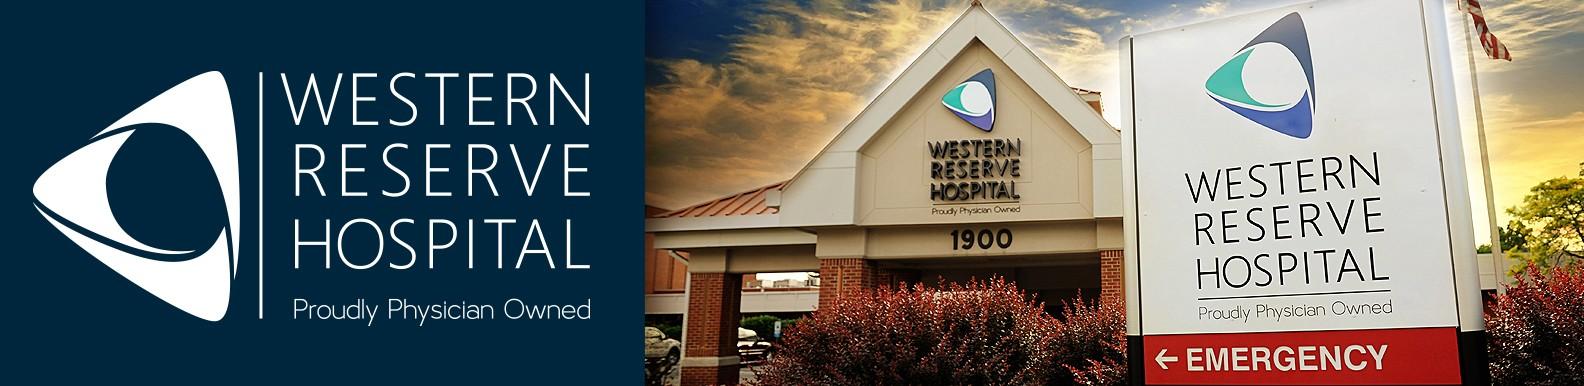 Western Reserve Hospital | LinkedIn